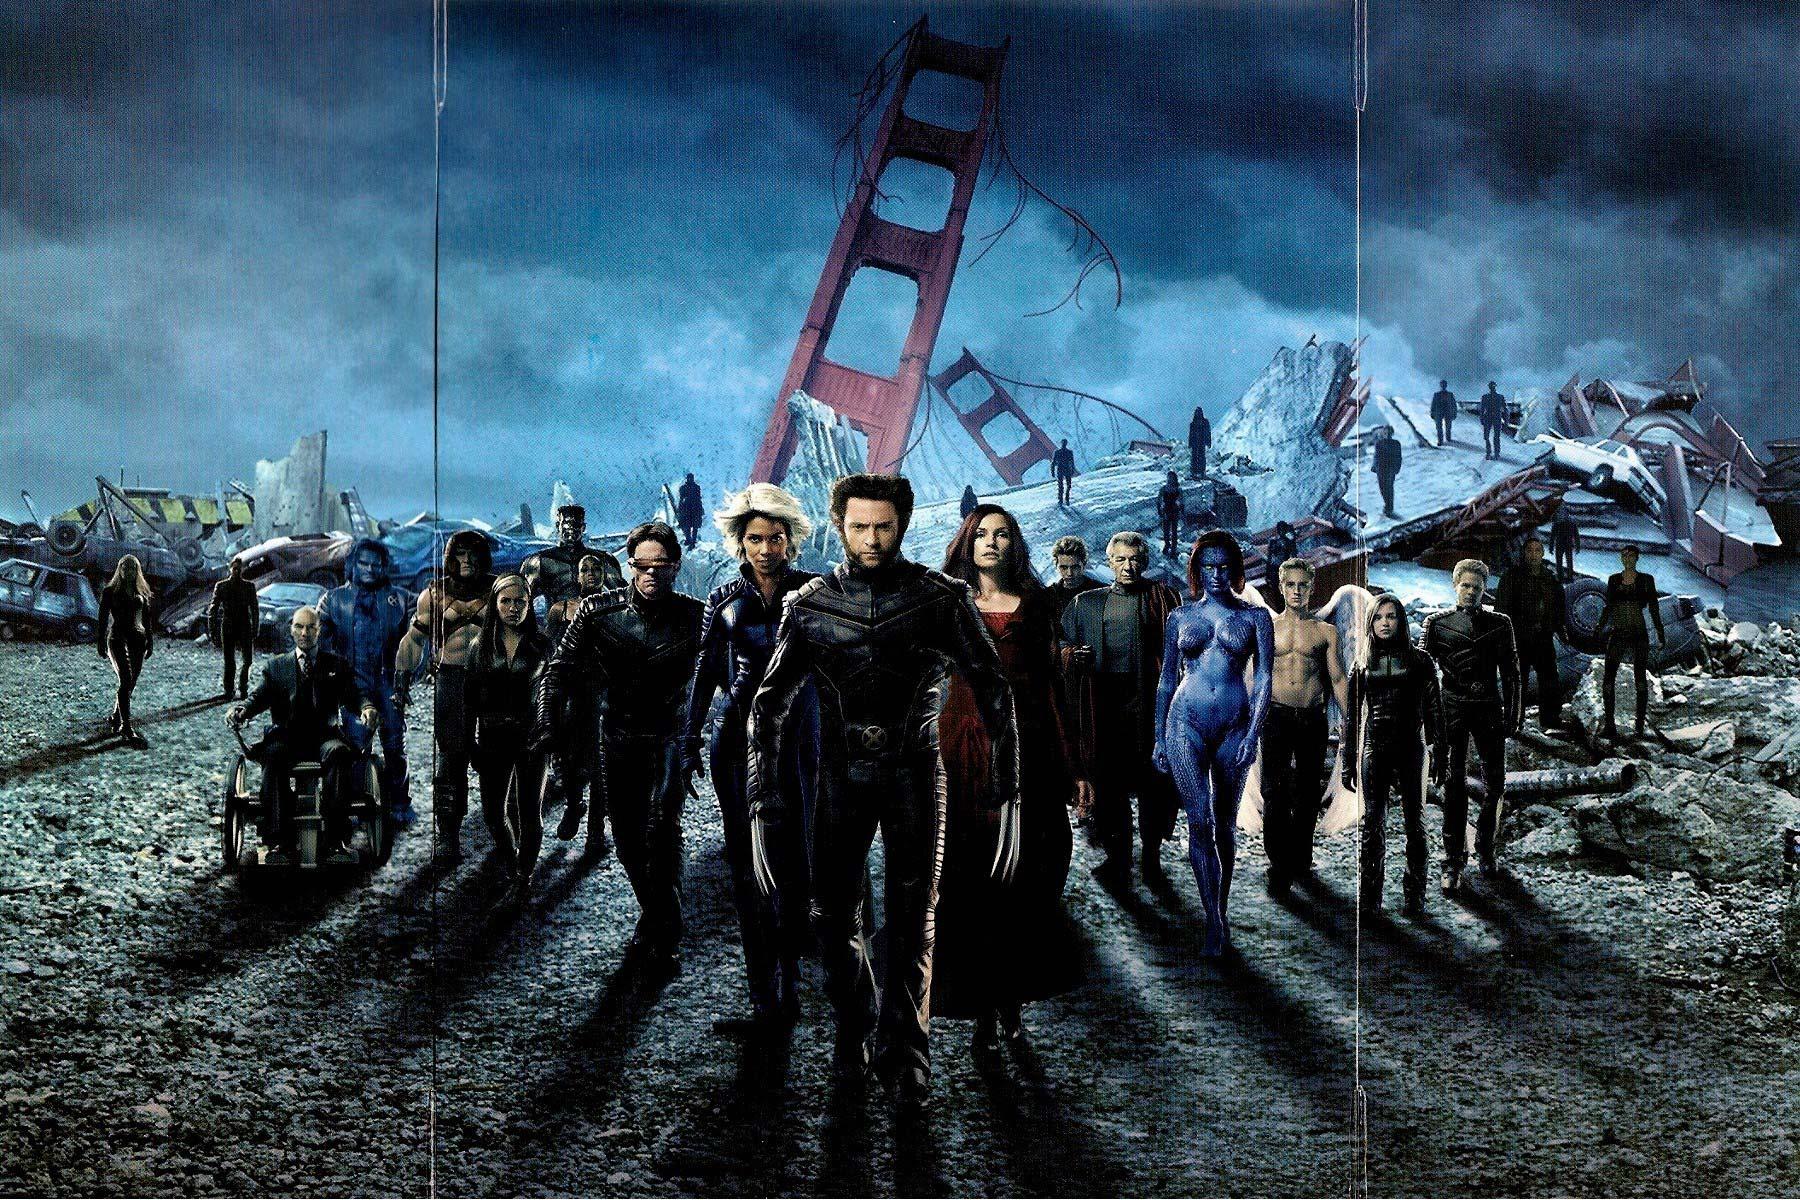 Hugh Jackman X Men Wolverine Wallpapers HD Collection 1800x1200